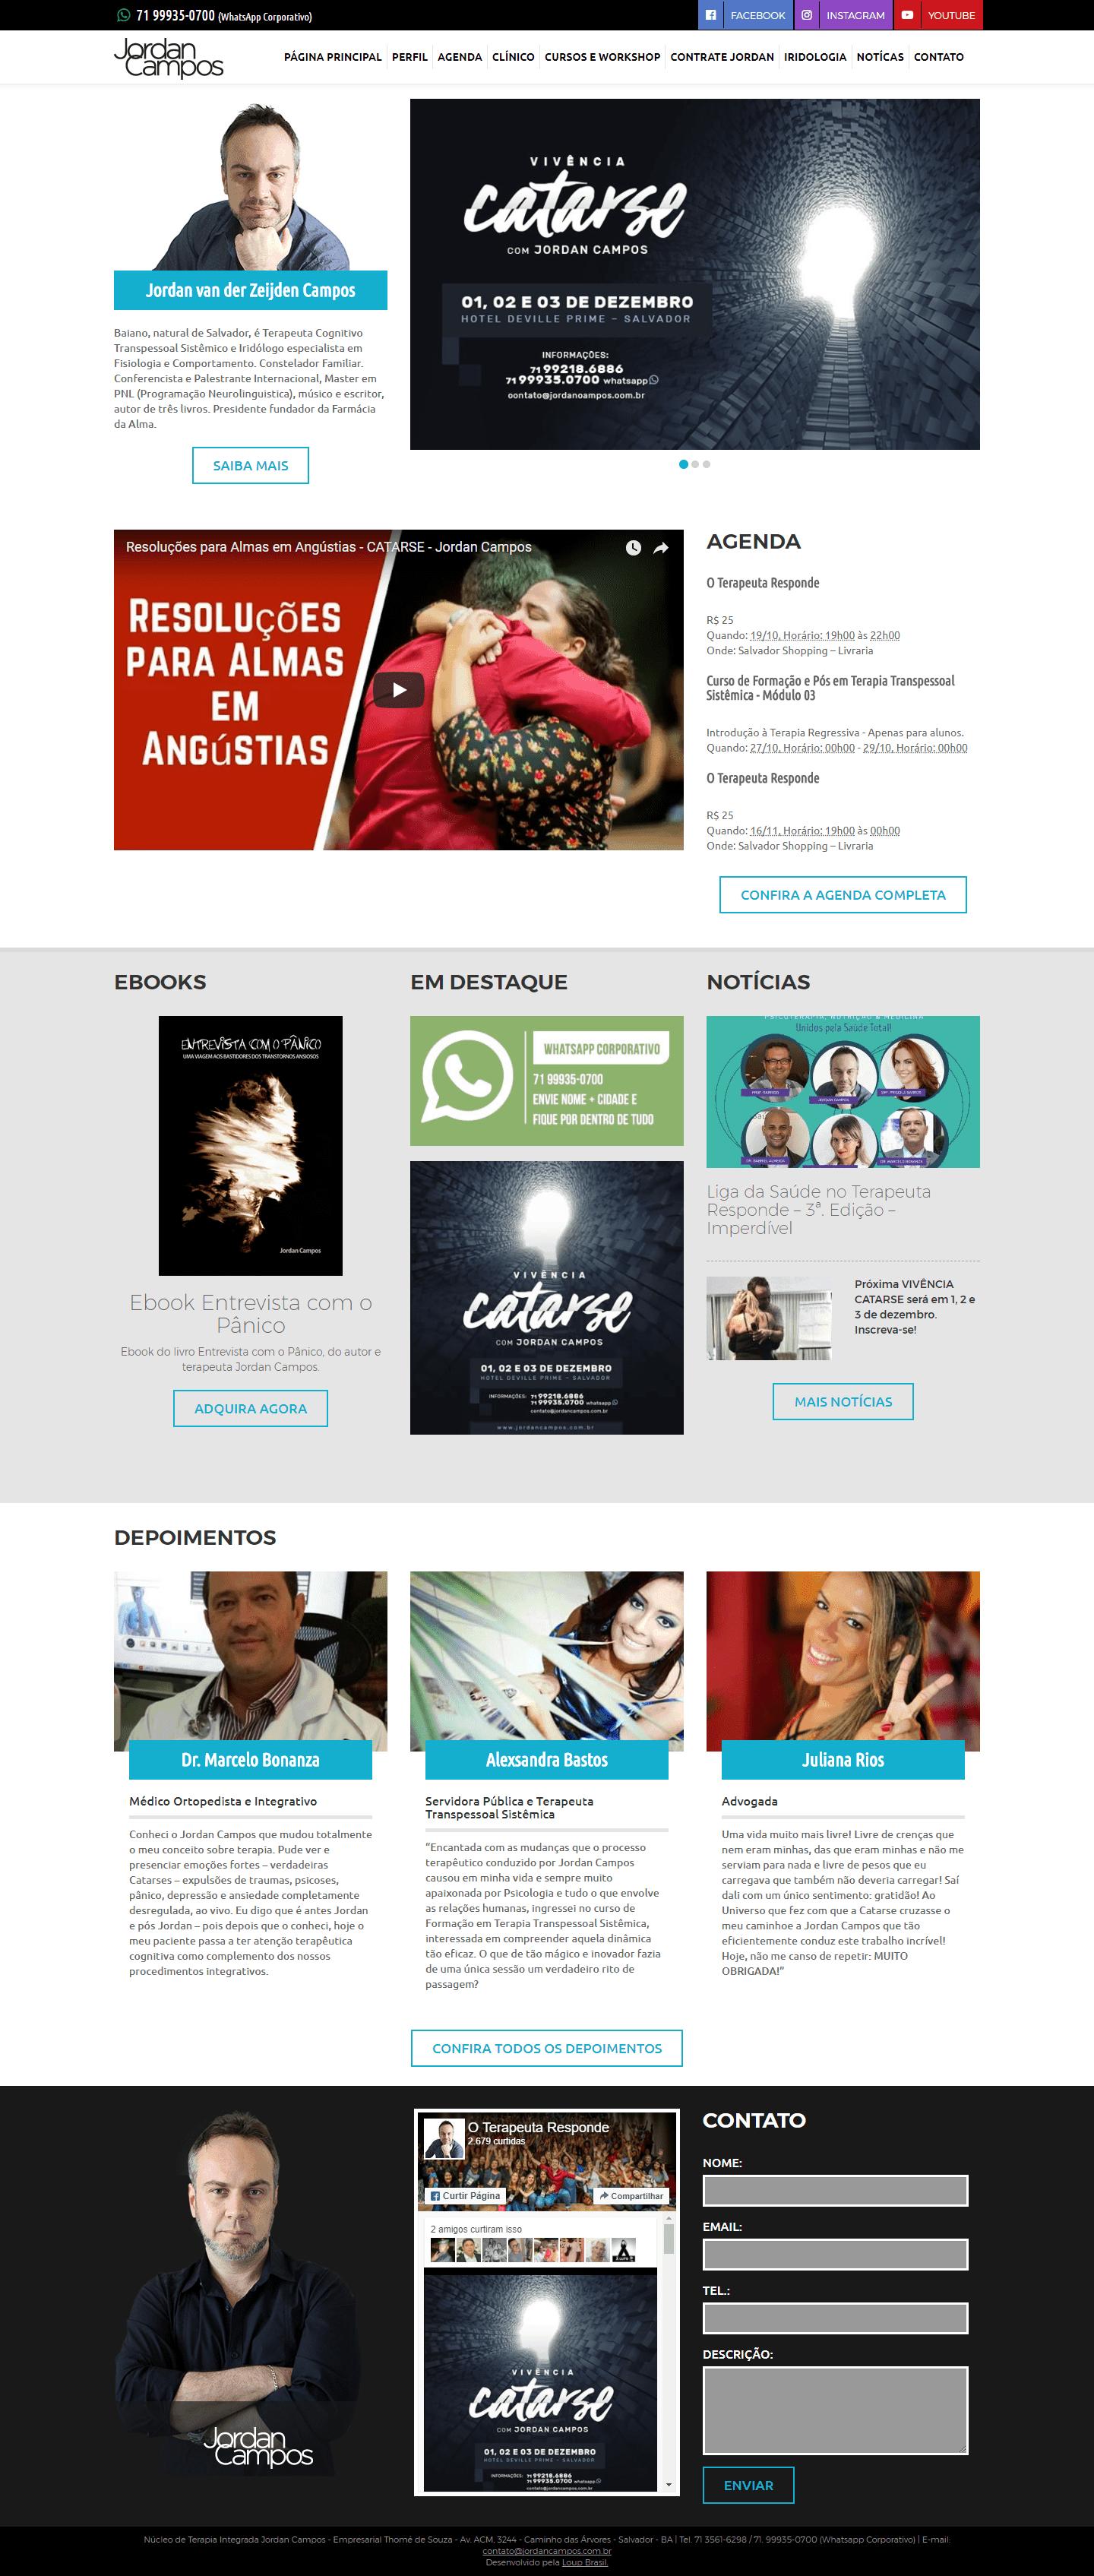 Página principal do site Jordan Campos.